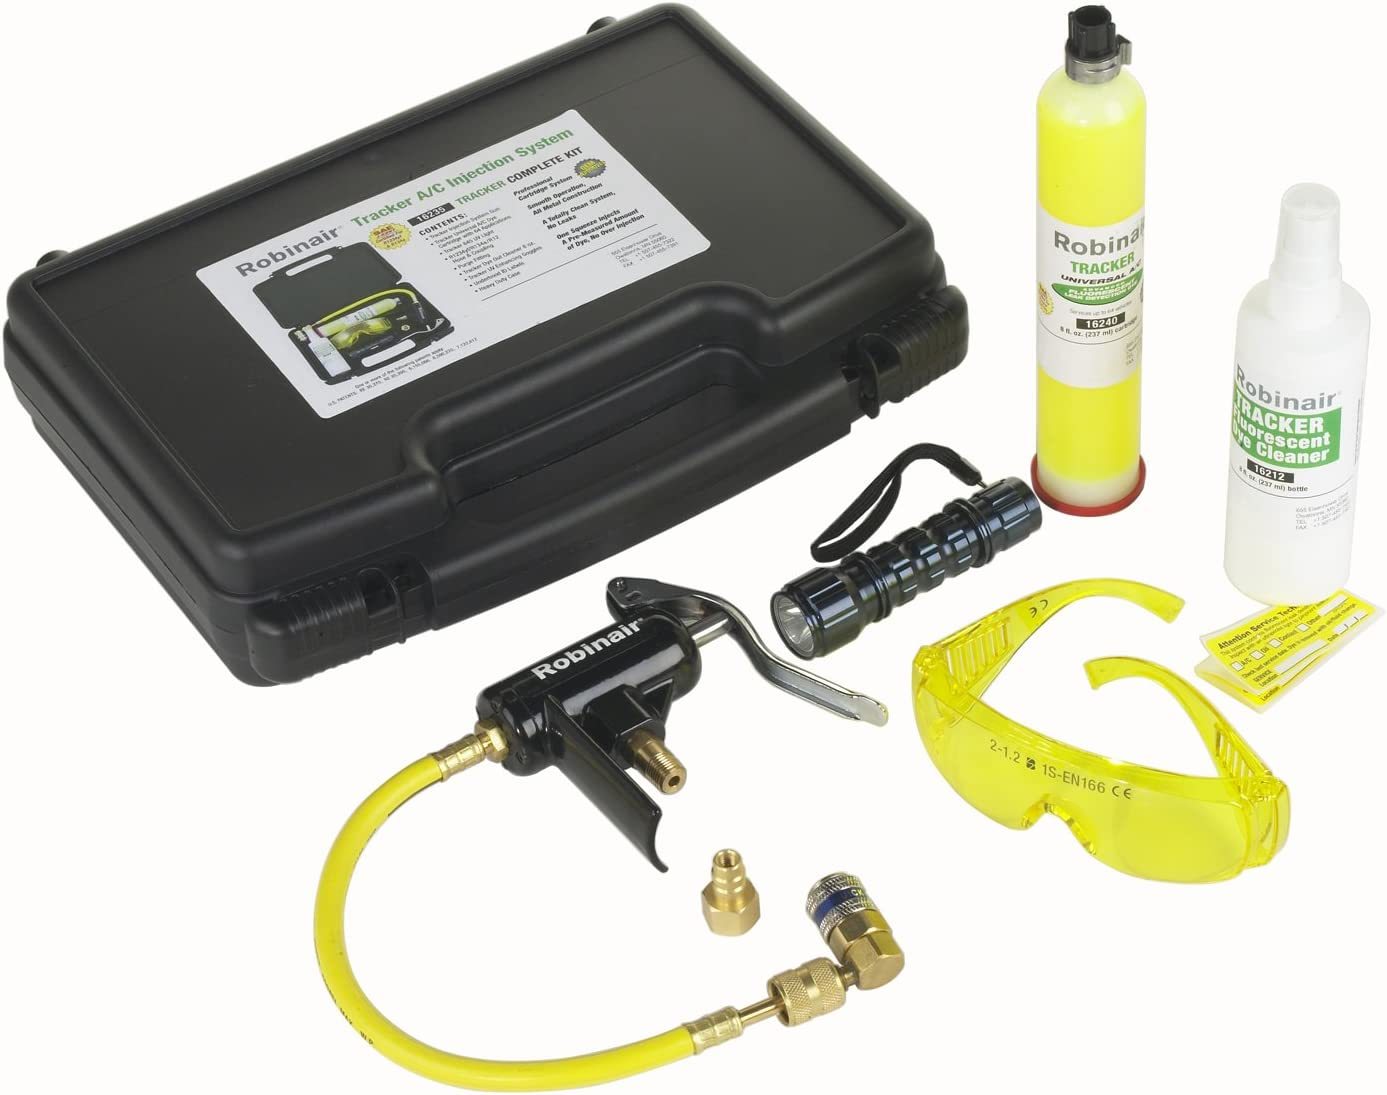 Robinair (16235) UV Leak Detection Kit